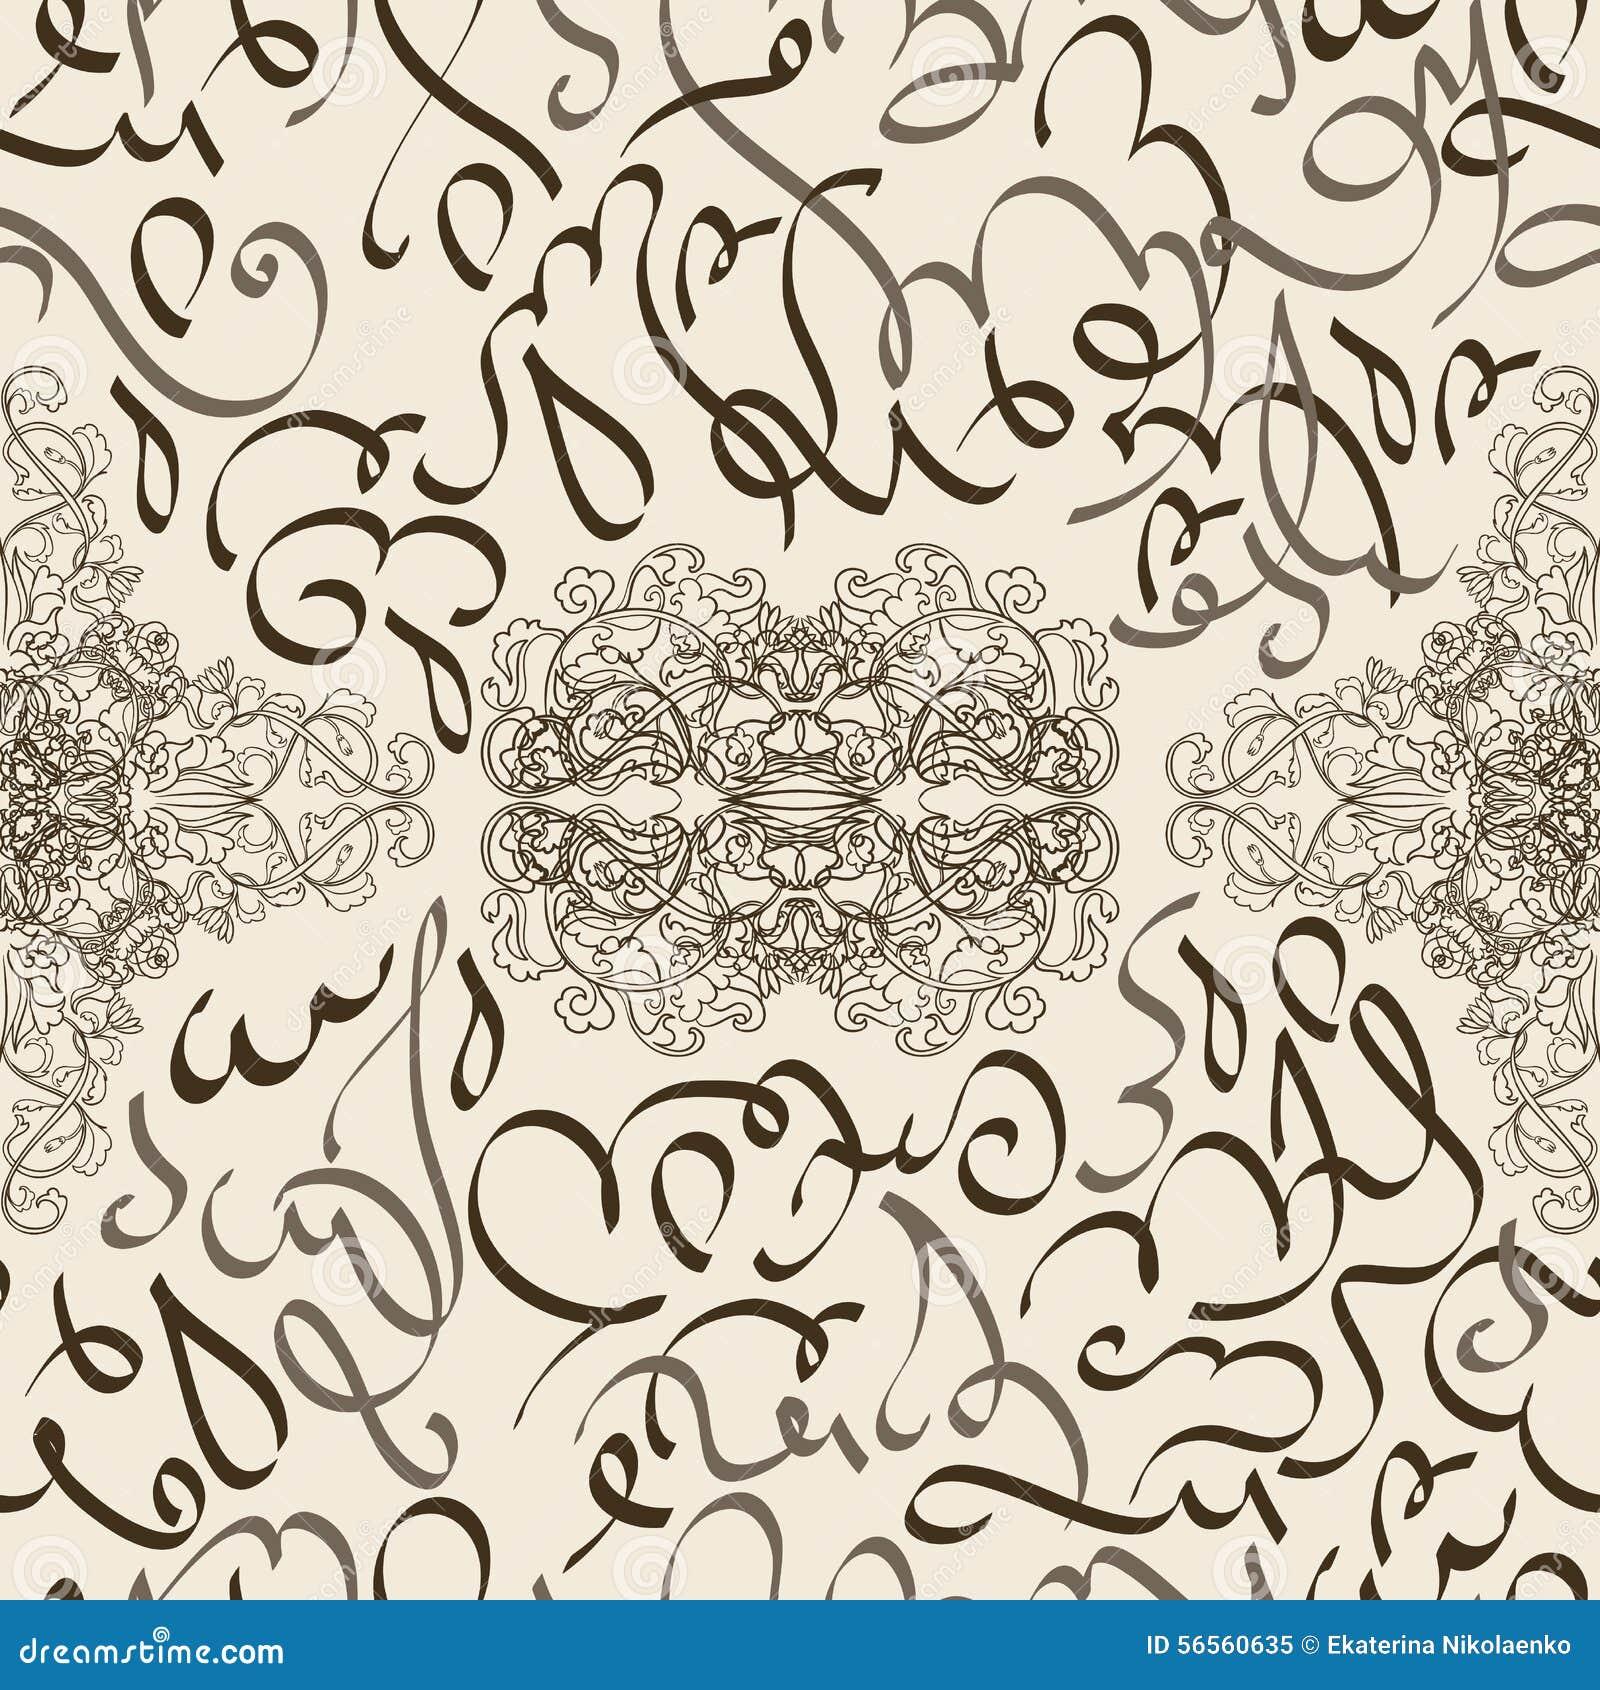 Download Άνευ ραφής αραβική καλλιγραφία διακοσμήσεων σχεδίων της έννοιας Eid Μουμπάρακ κειμένων για το μουσουλμανικό κοινοτικό φεστιβάλ Διανυσματική απεικόνιση - εικονογραφία από μάθετε, ισλάμ: 56560635